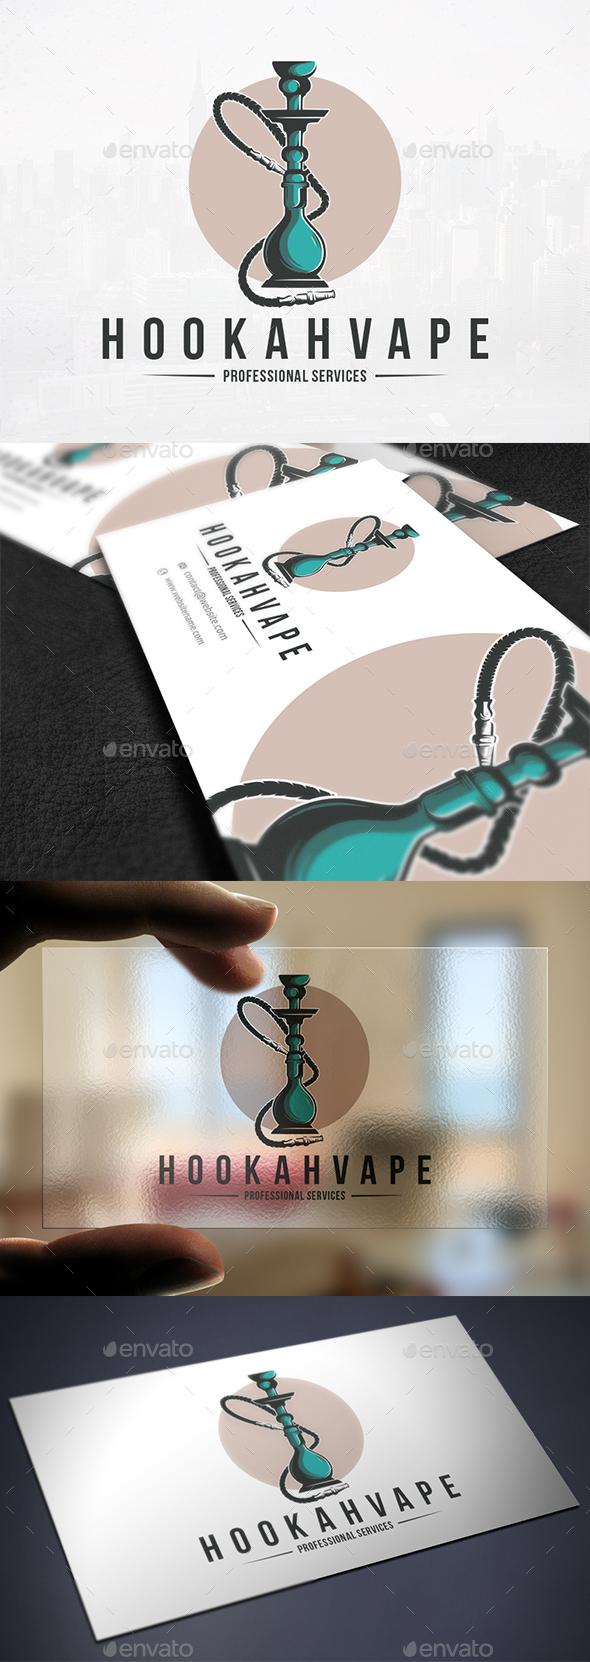 Shisha Hookah Logo Template - Objects Logo Templates